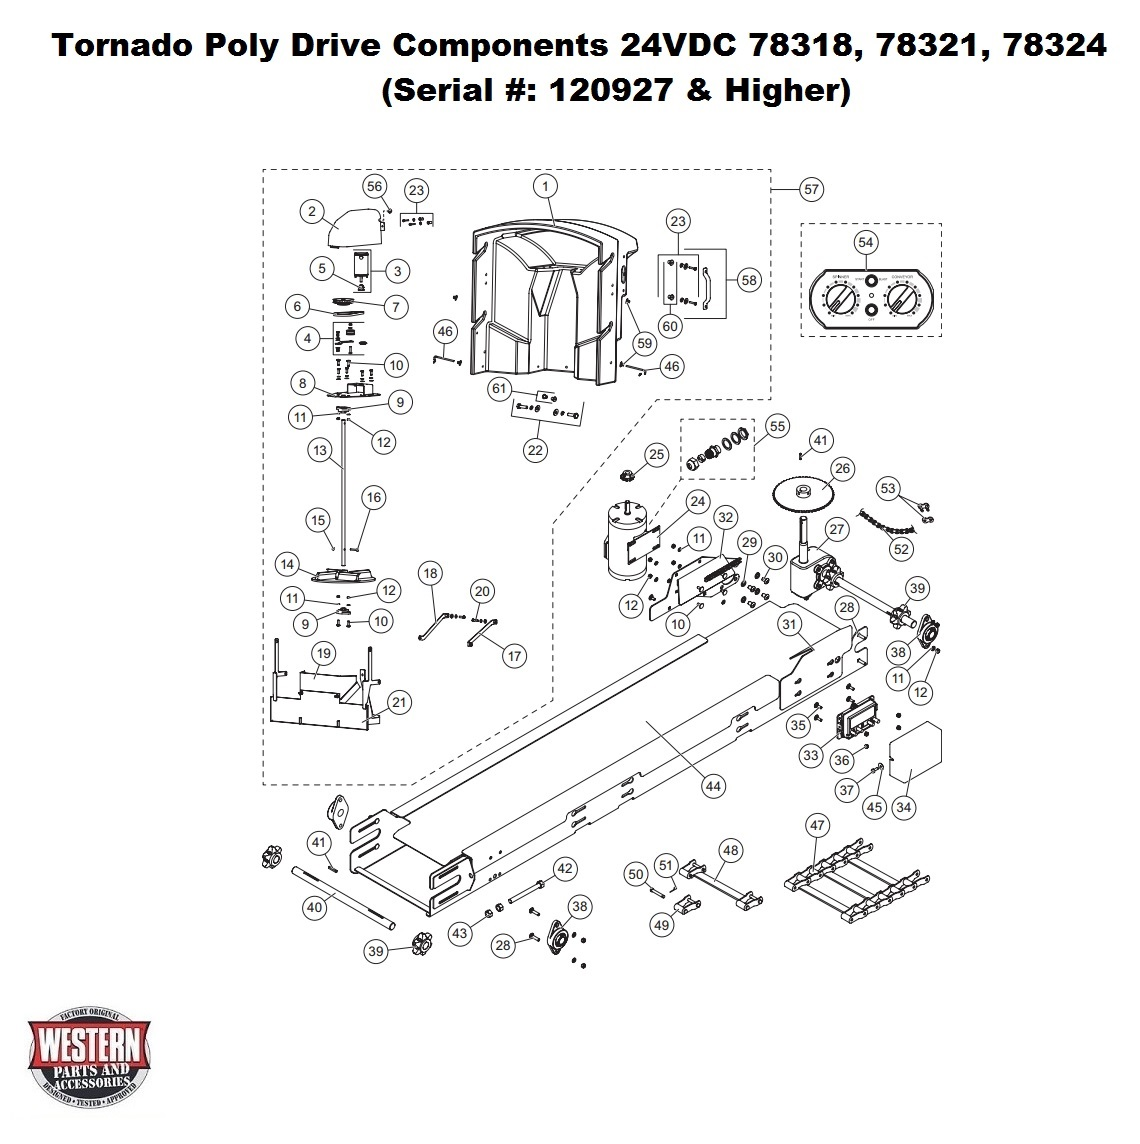 Tornado 24VDC 78318,78321,783254 (Serial # 120927 & Higher